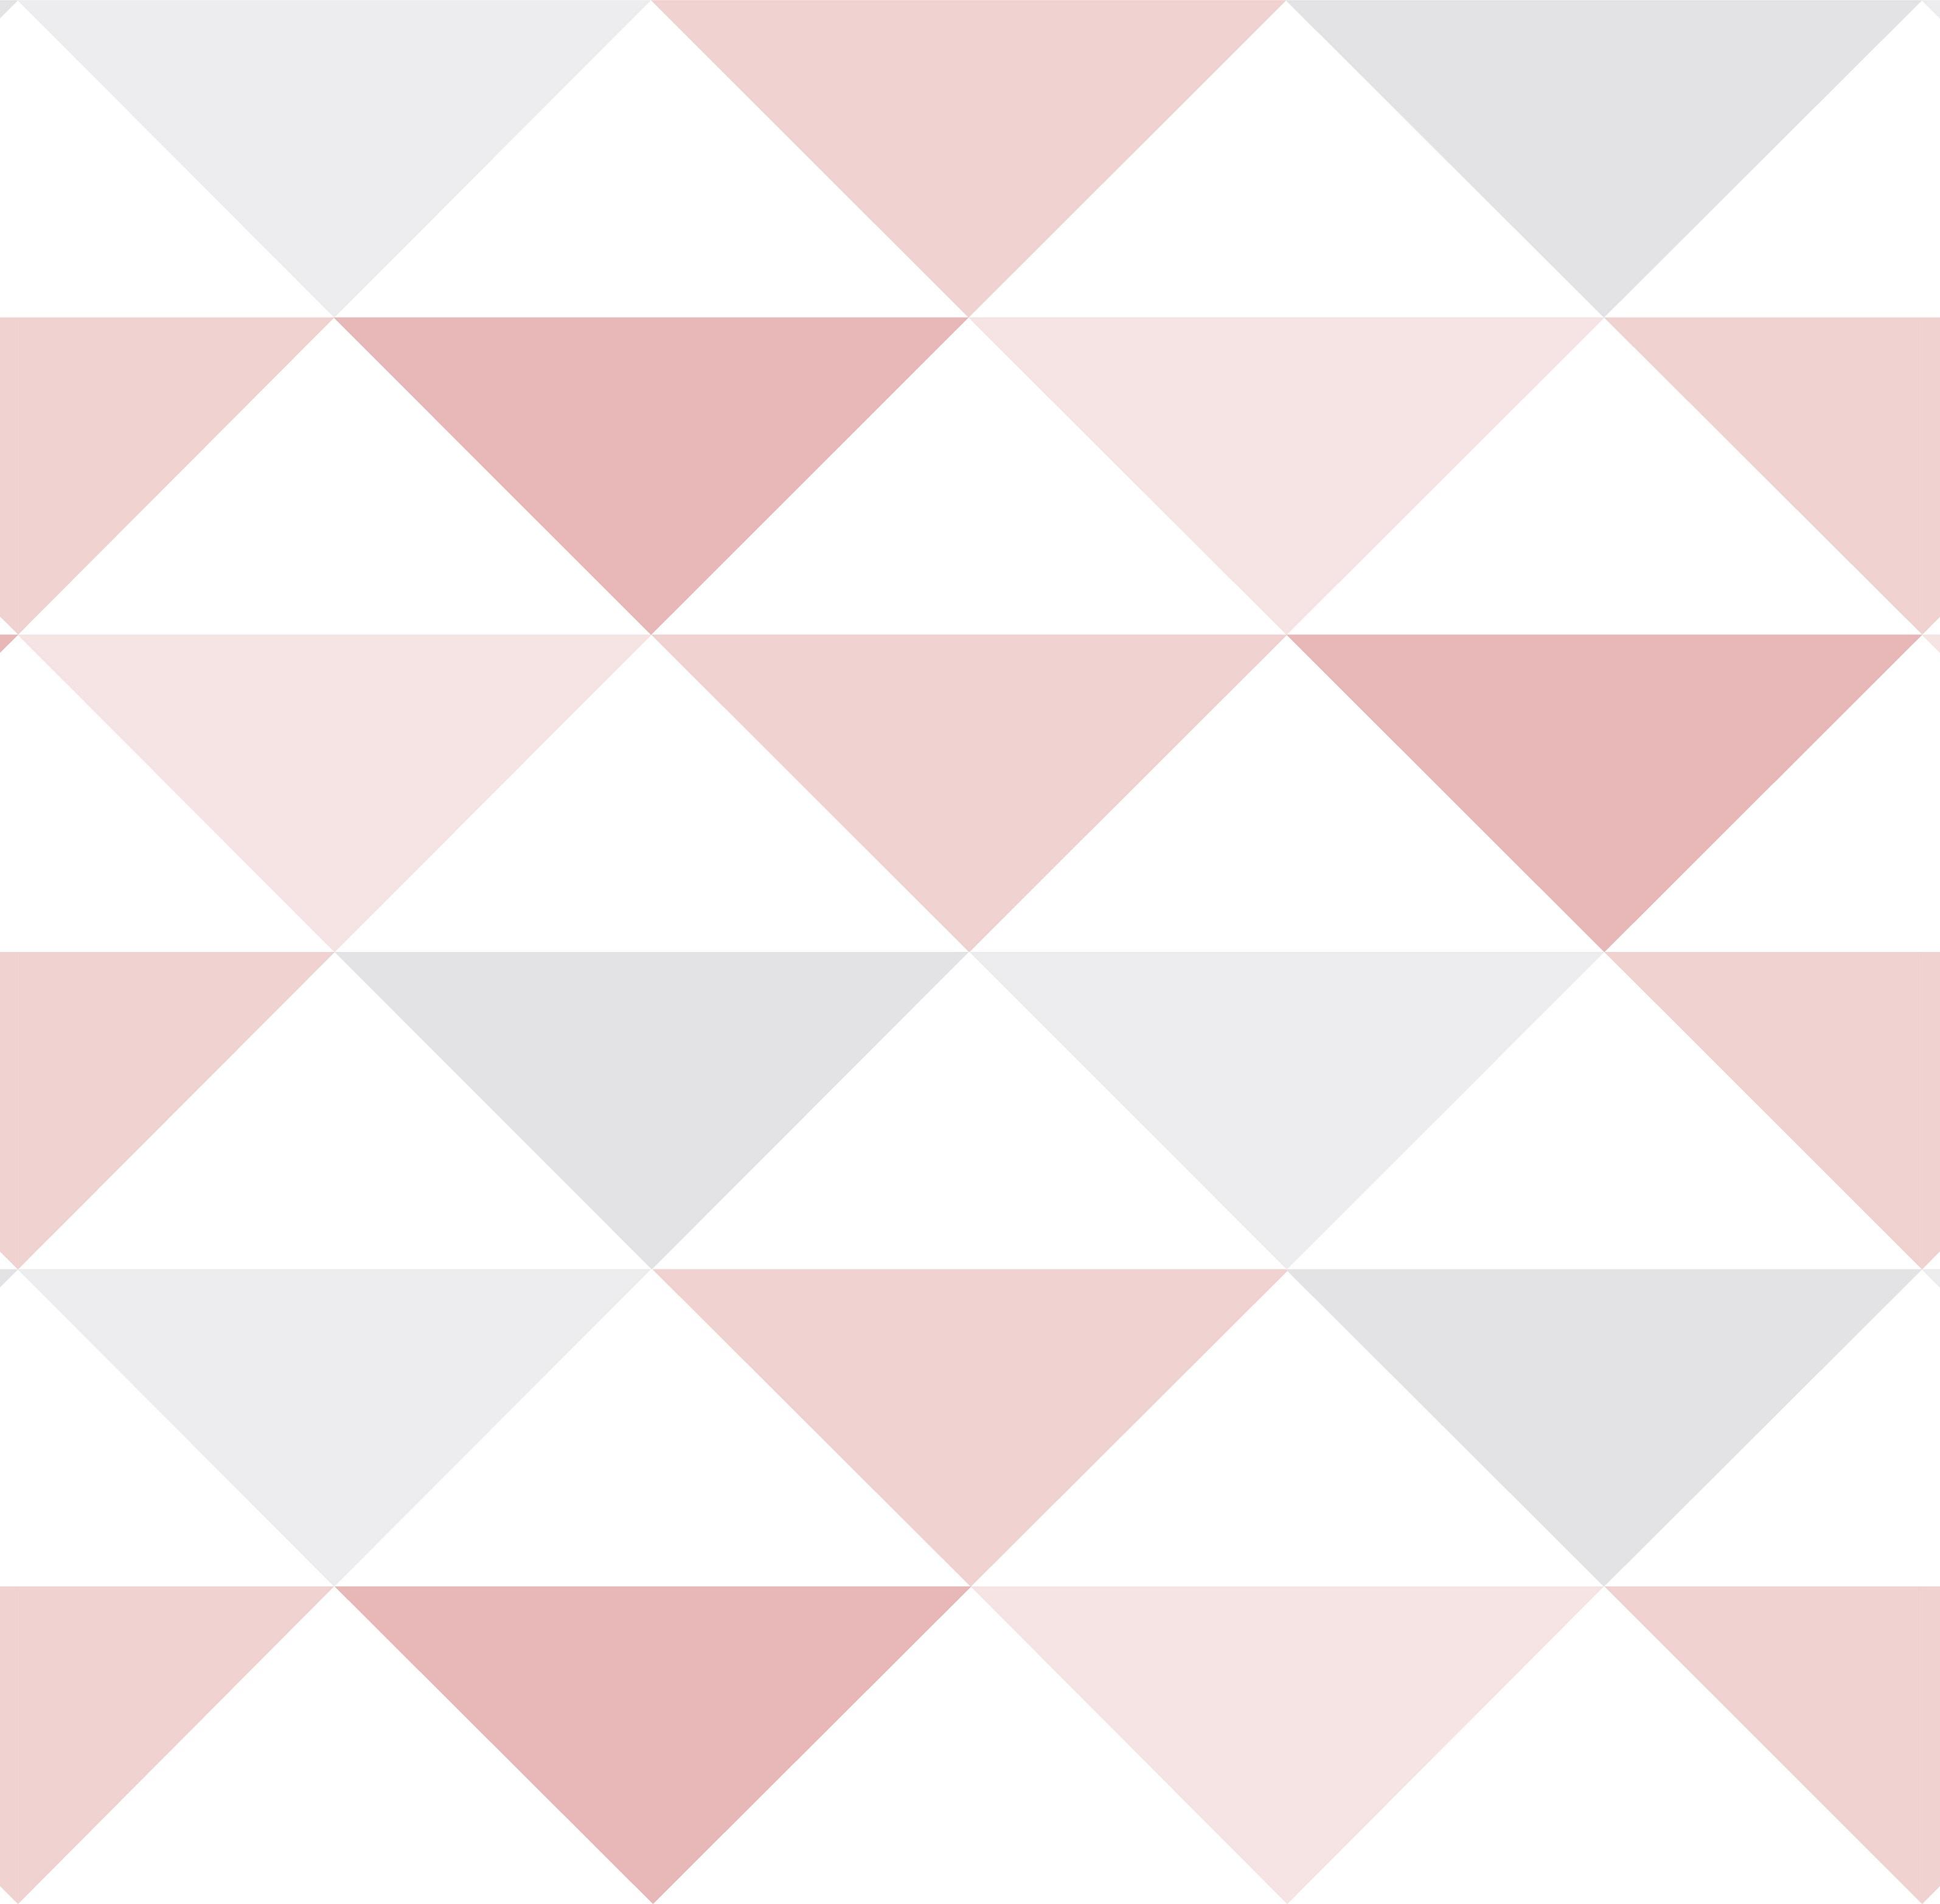 Geométrico triângulos_Variação_04